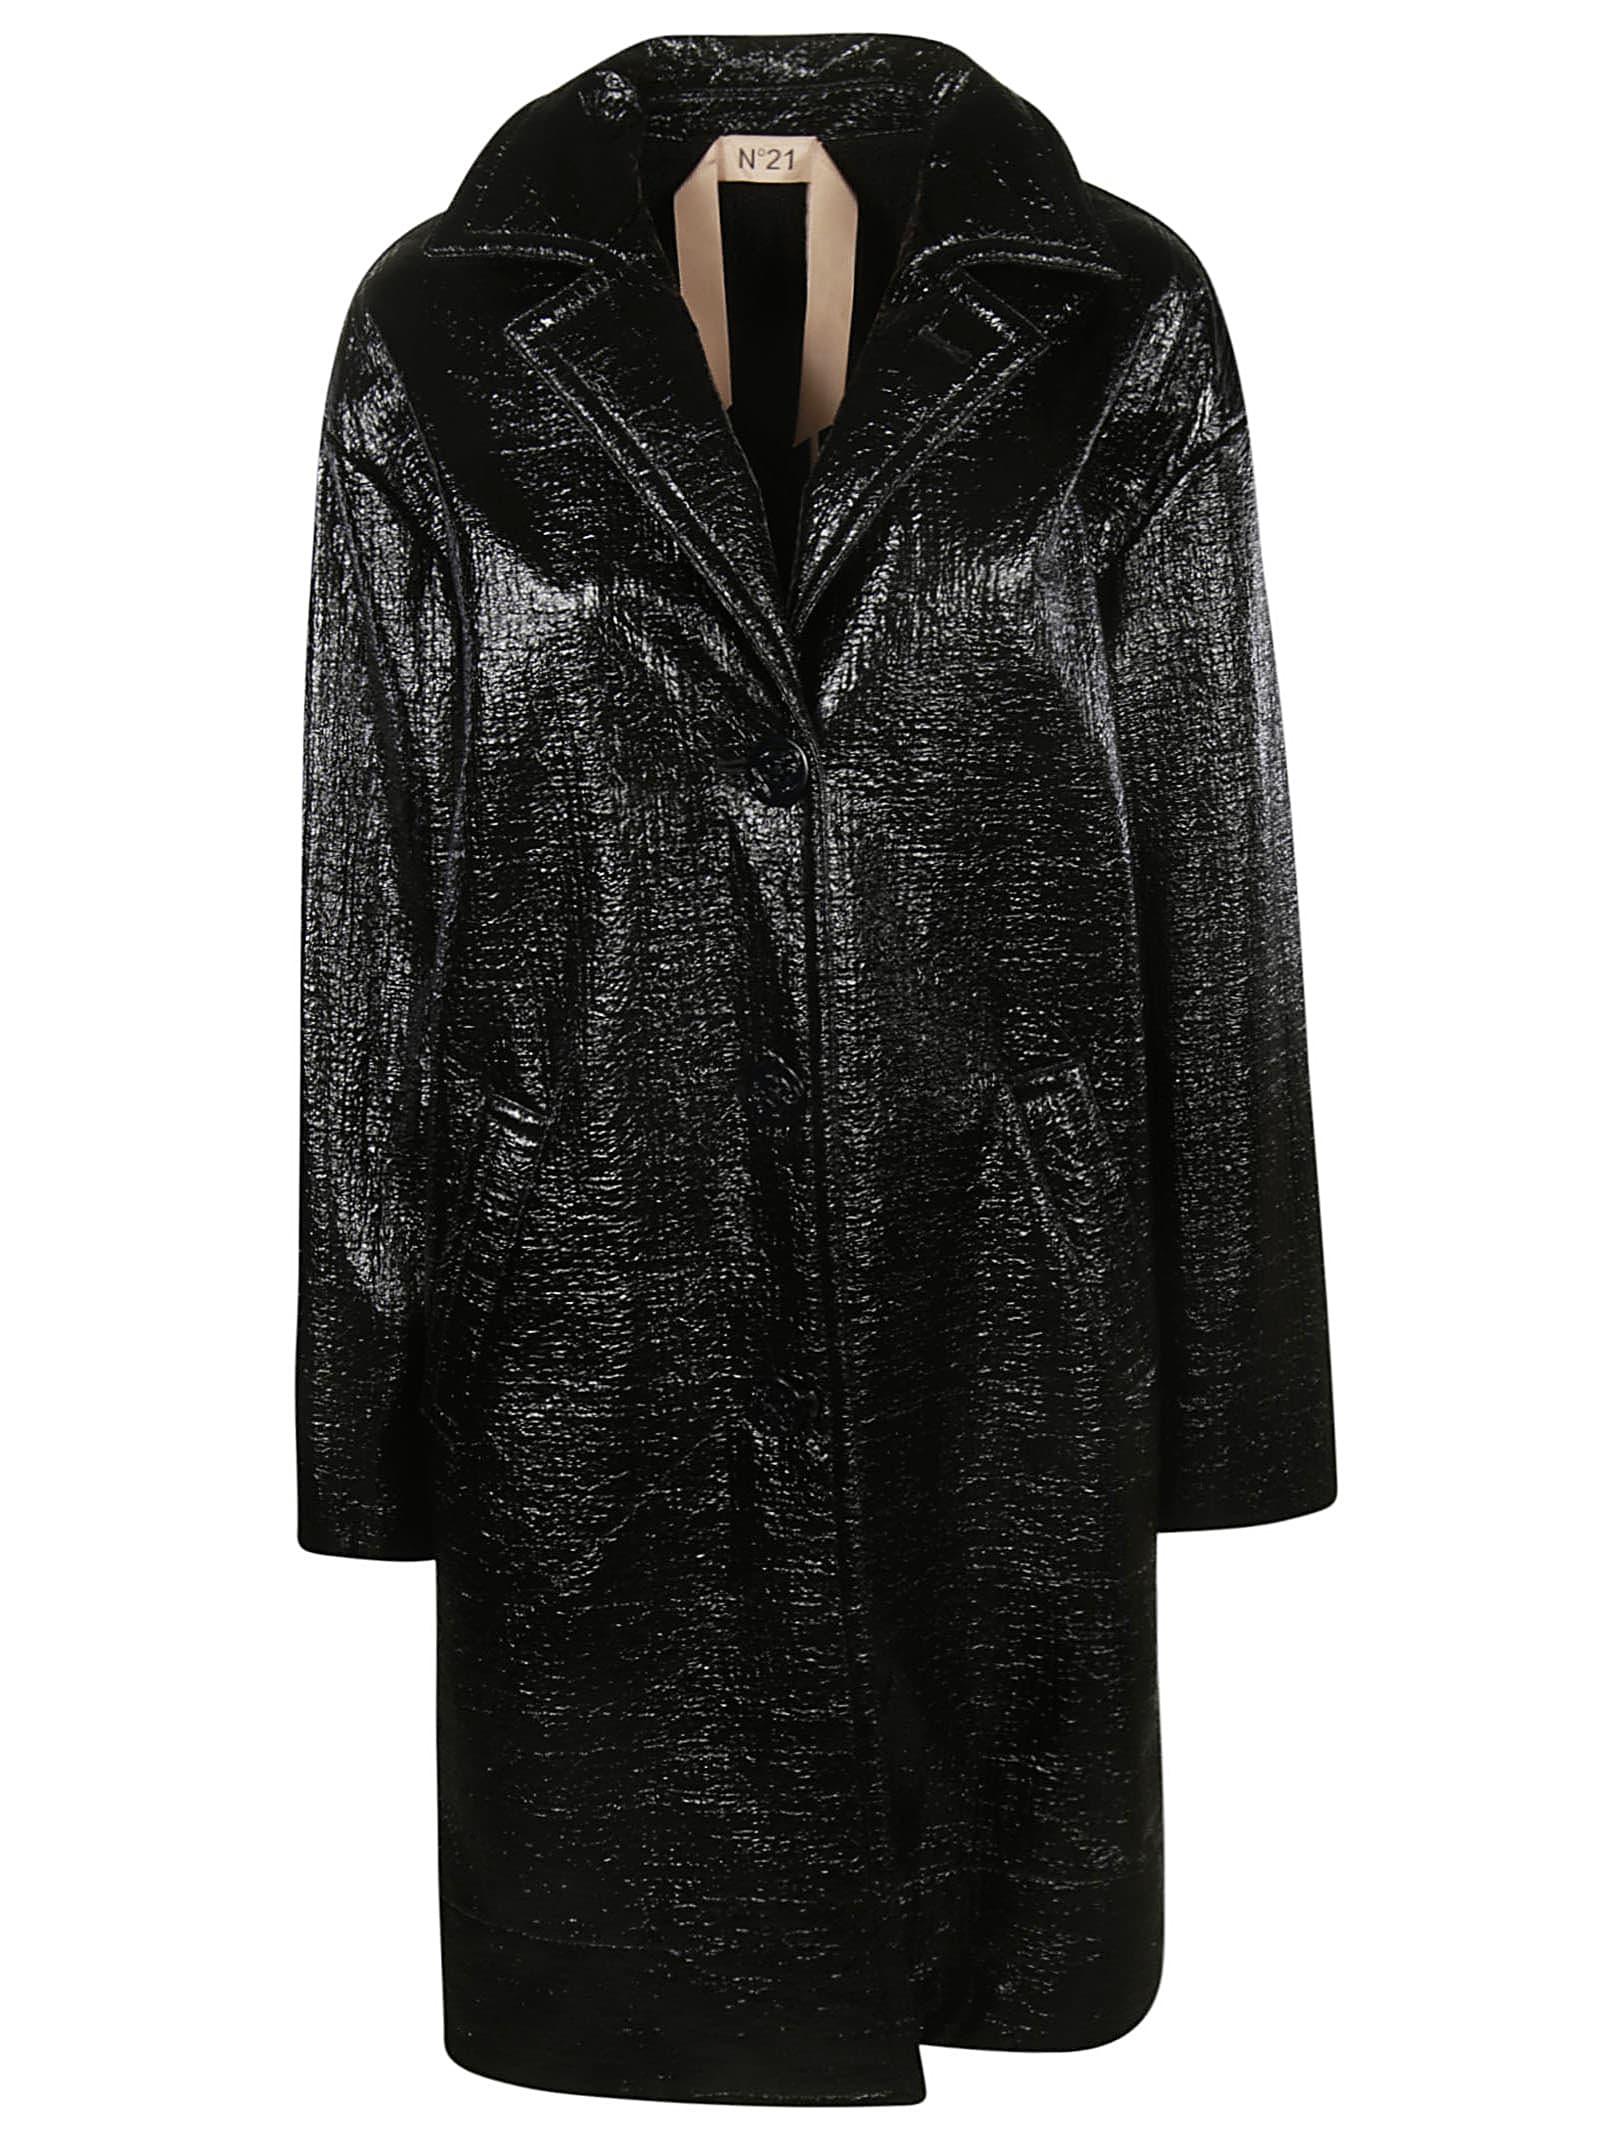 N.21 Single Breasted Coat